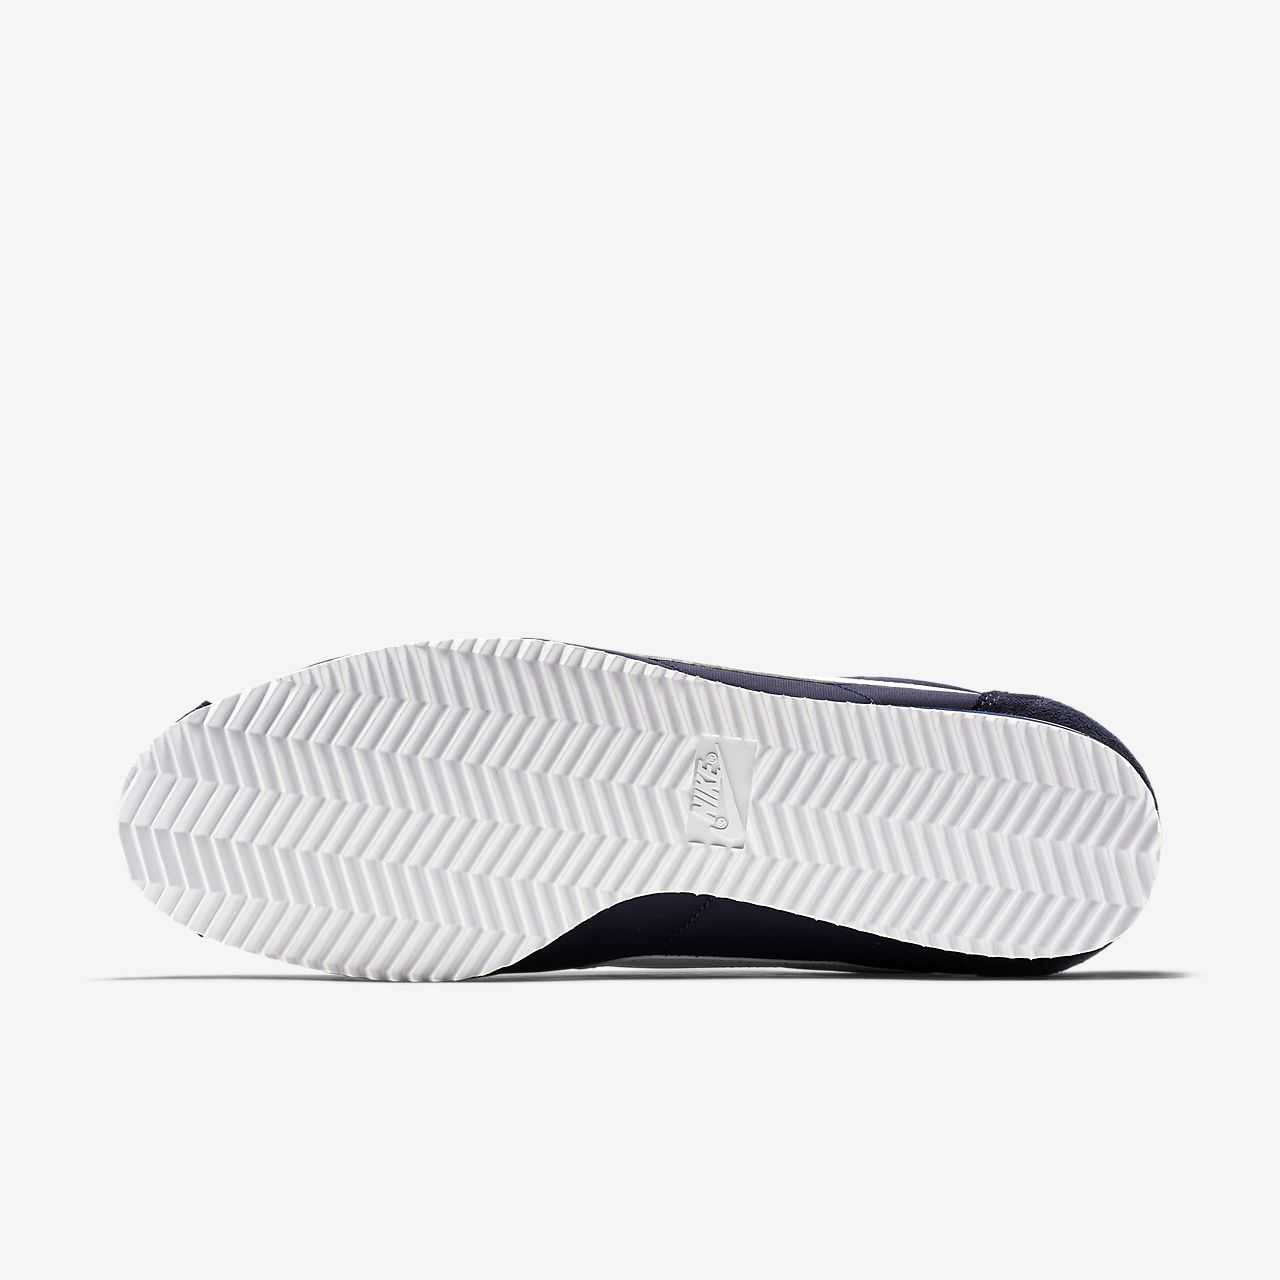 promo code 04976 20d52 ... Nike Classic Cortez Nylon Unisex Shoe